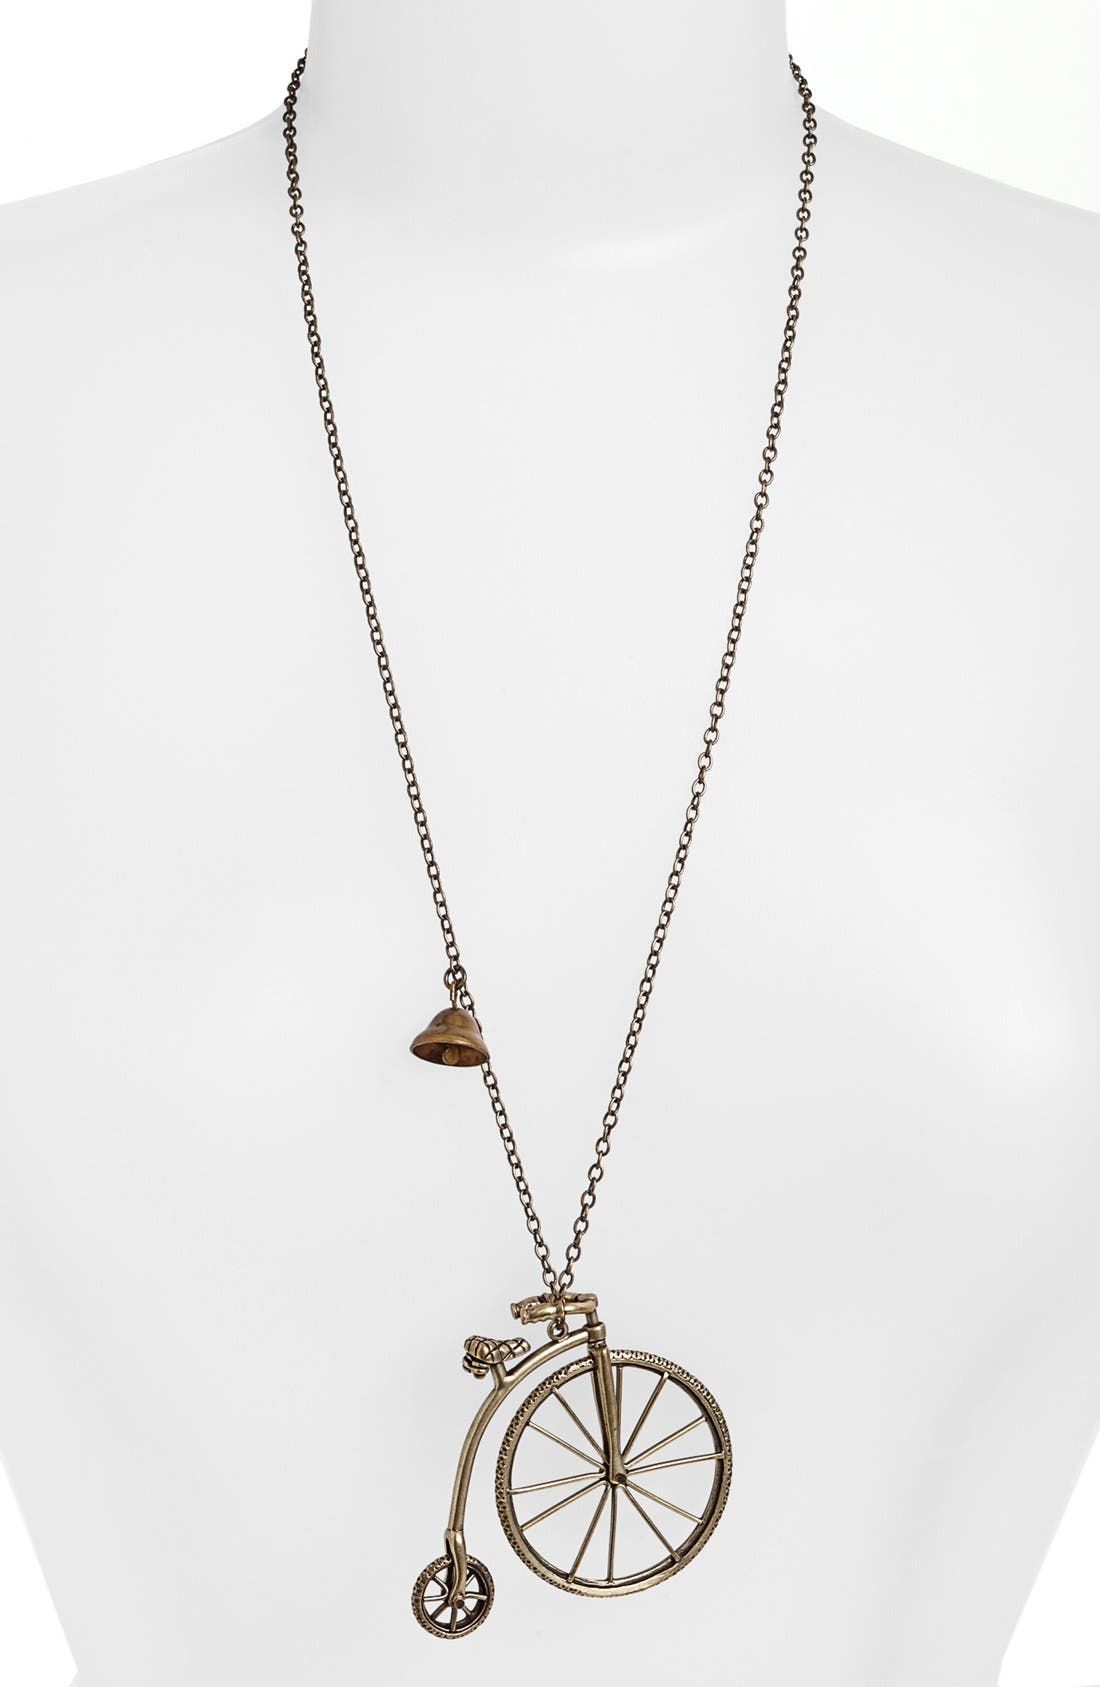 Main Image - Nordstrom 'Antique Conversation' Bicycle Pendant Necklace